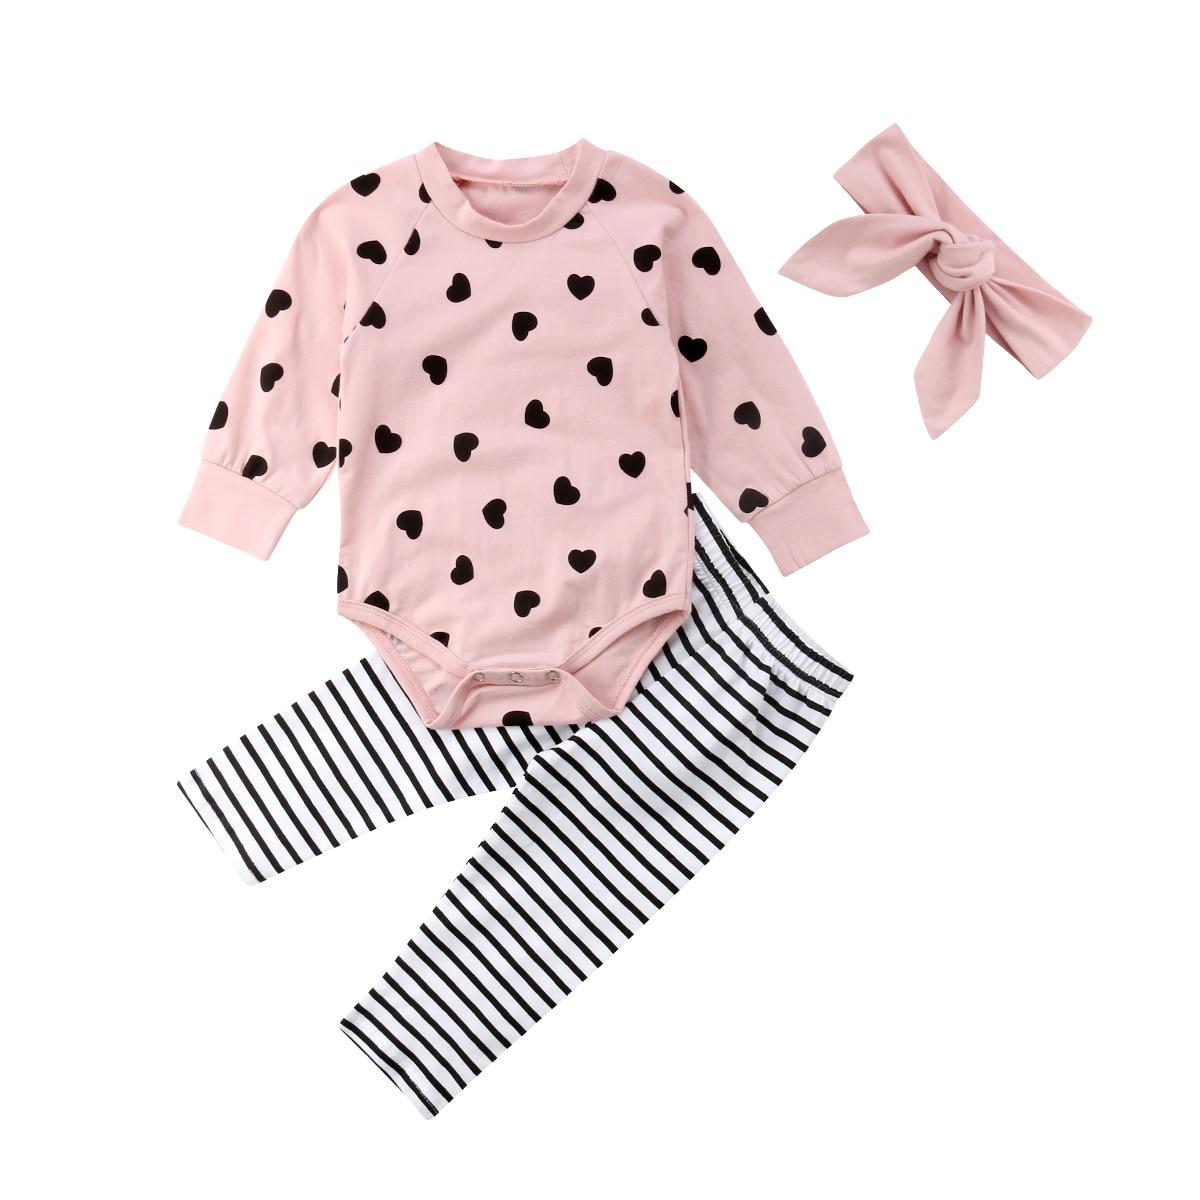 3pcs Newborn Baby Girls Boys Romper Tops+Long Pants+Headband Clothes Outfit Set